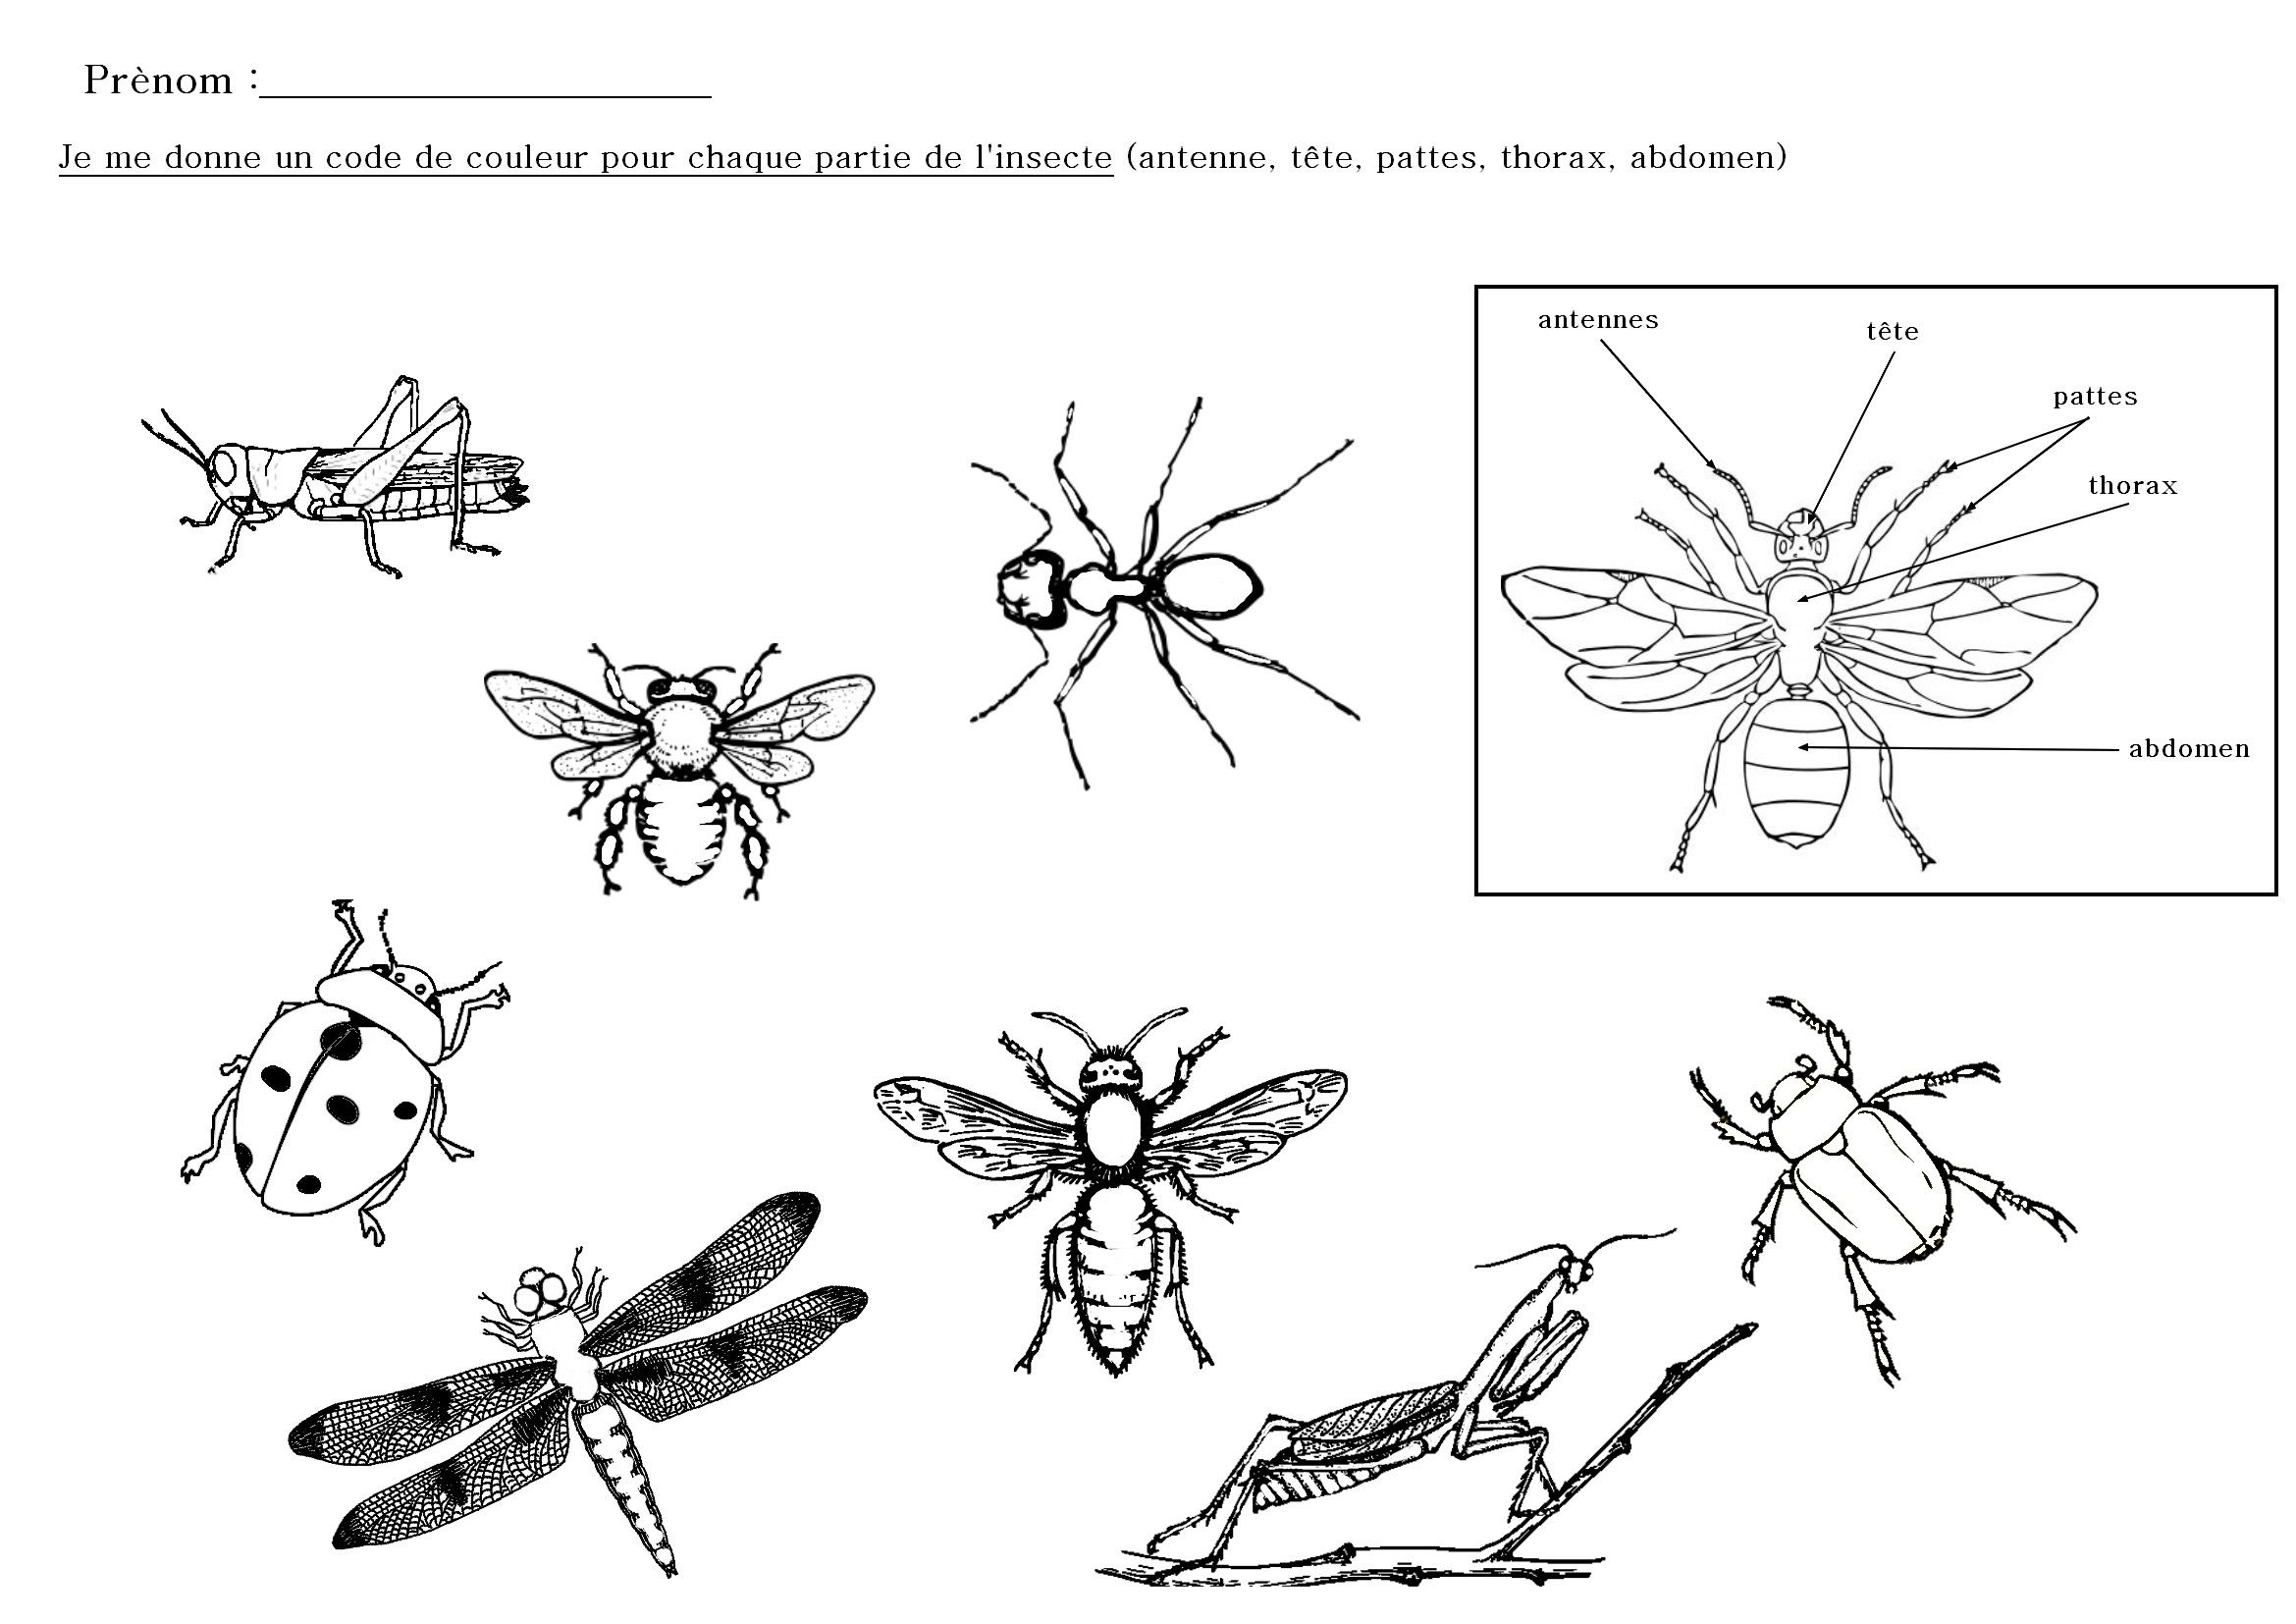 les diff rentes parties des insectes colorier projet insectes gs pinterest insectes. Black Bedroom Furniture Sets. Home Design Ideas